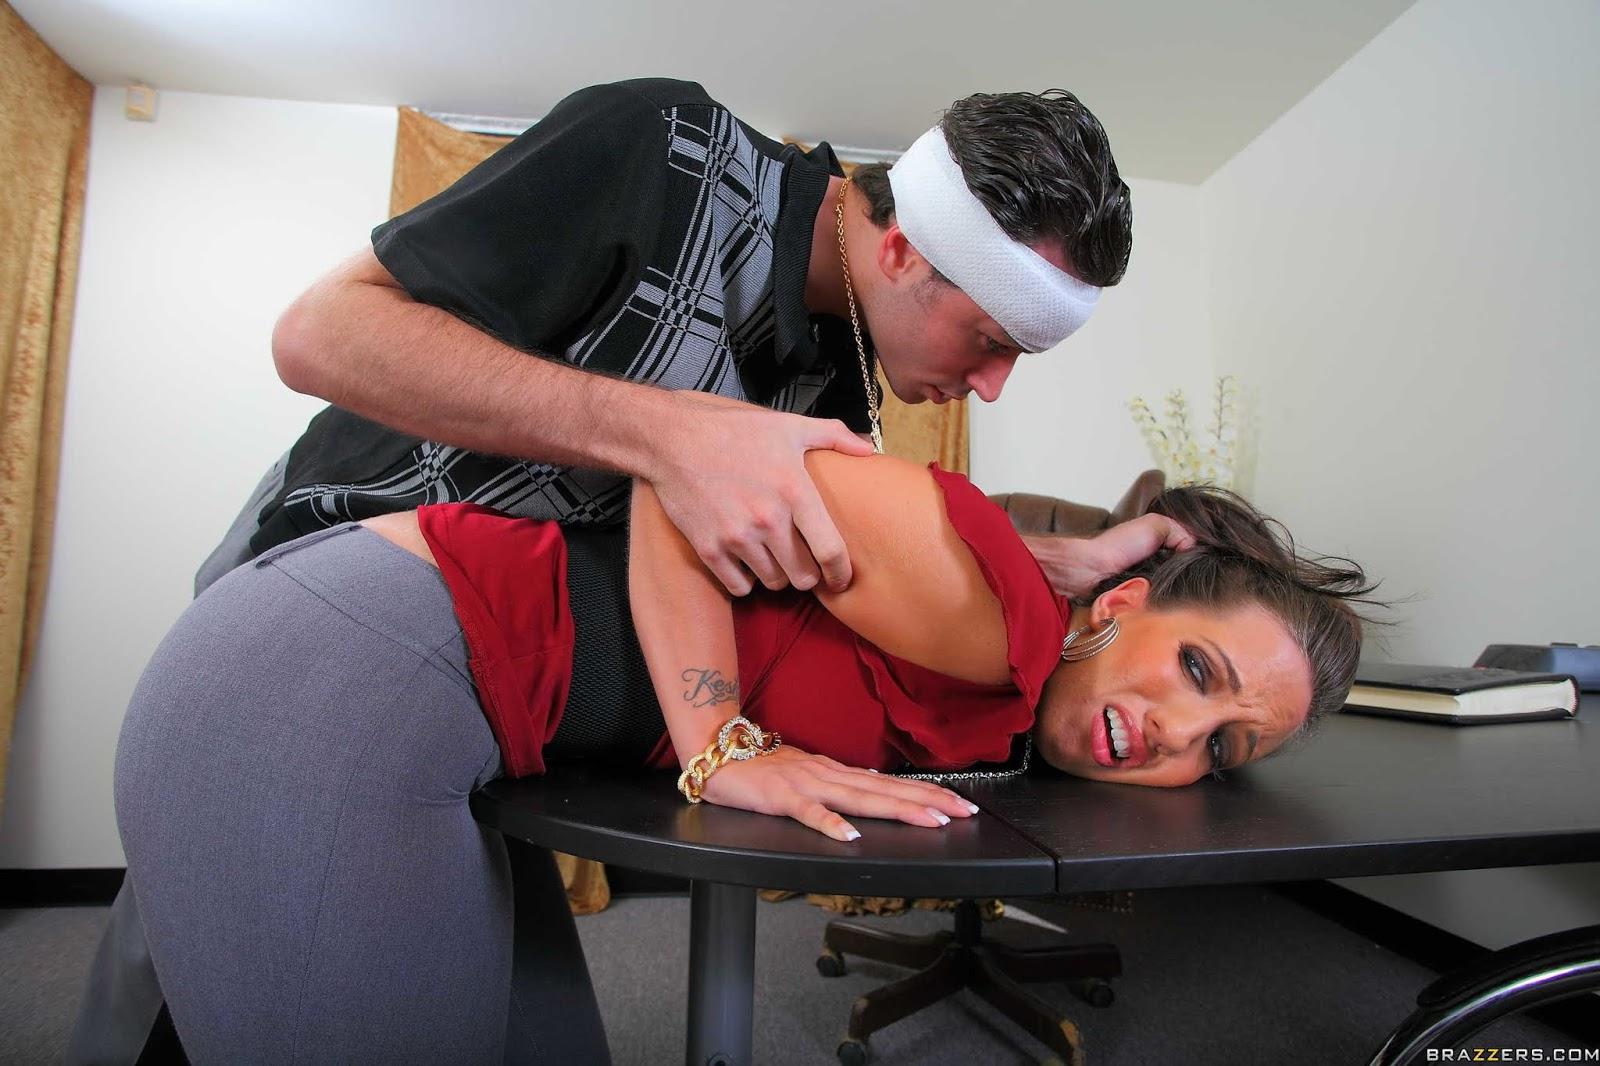 начала порно наказание аналом секретаршу была